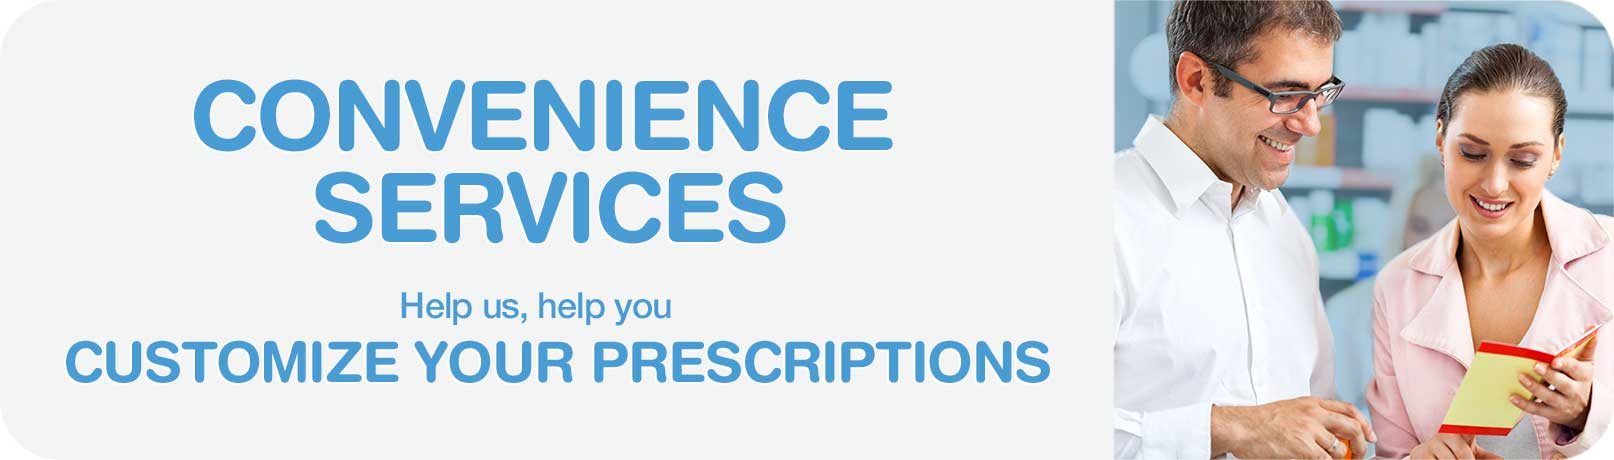 convenience services help us help you customize your prescriptions - Walgreens Prescription Discount Card